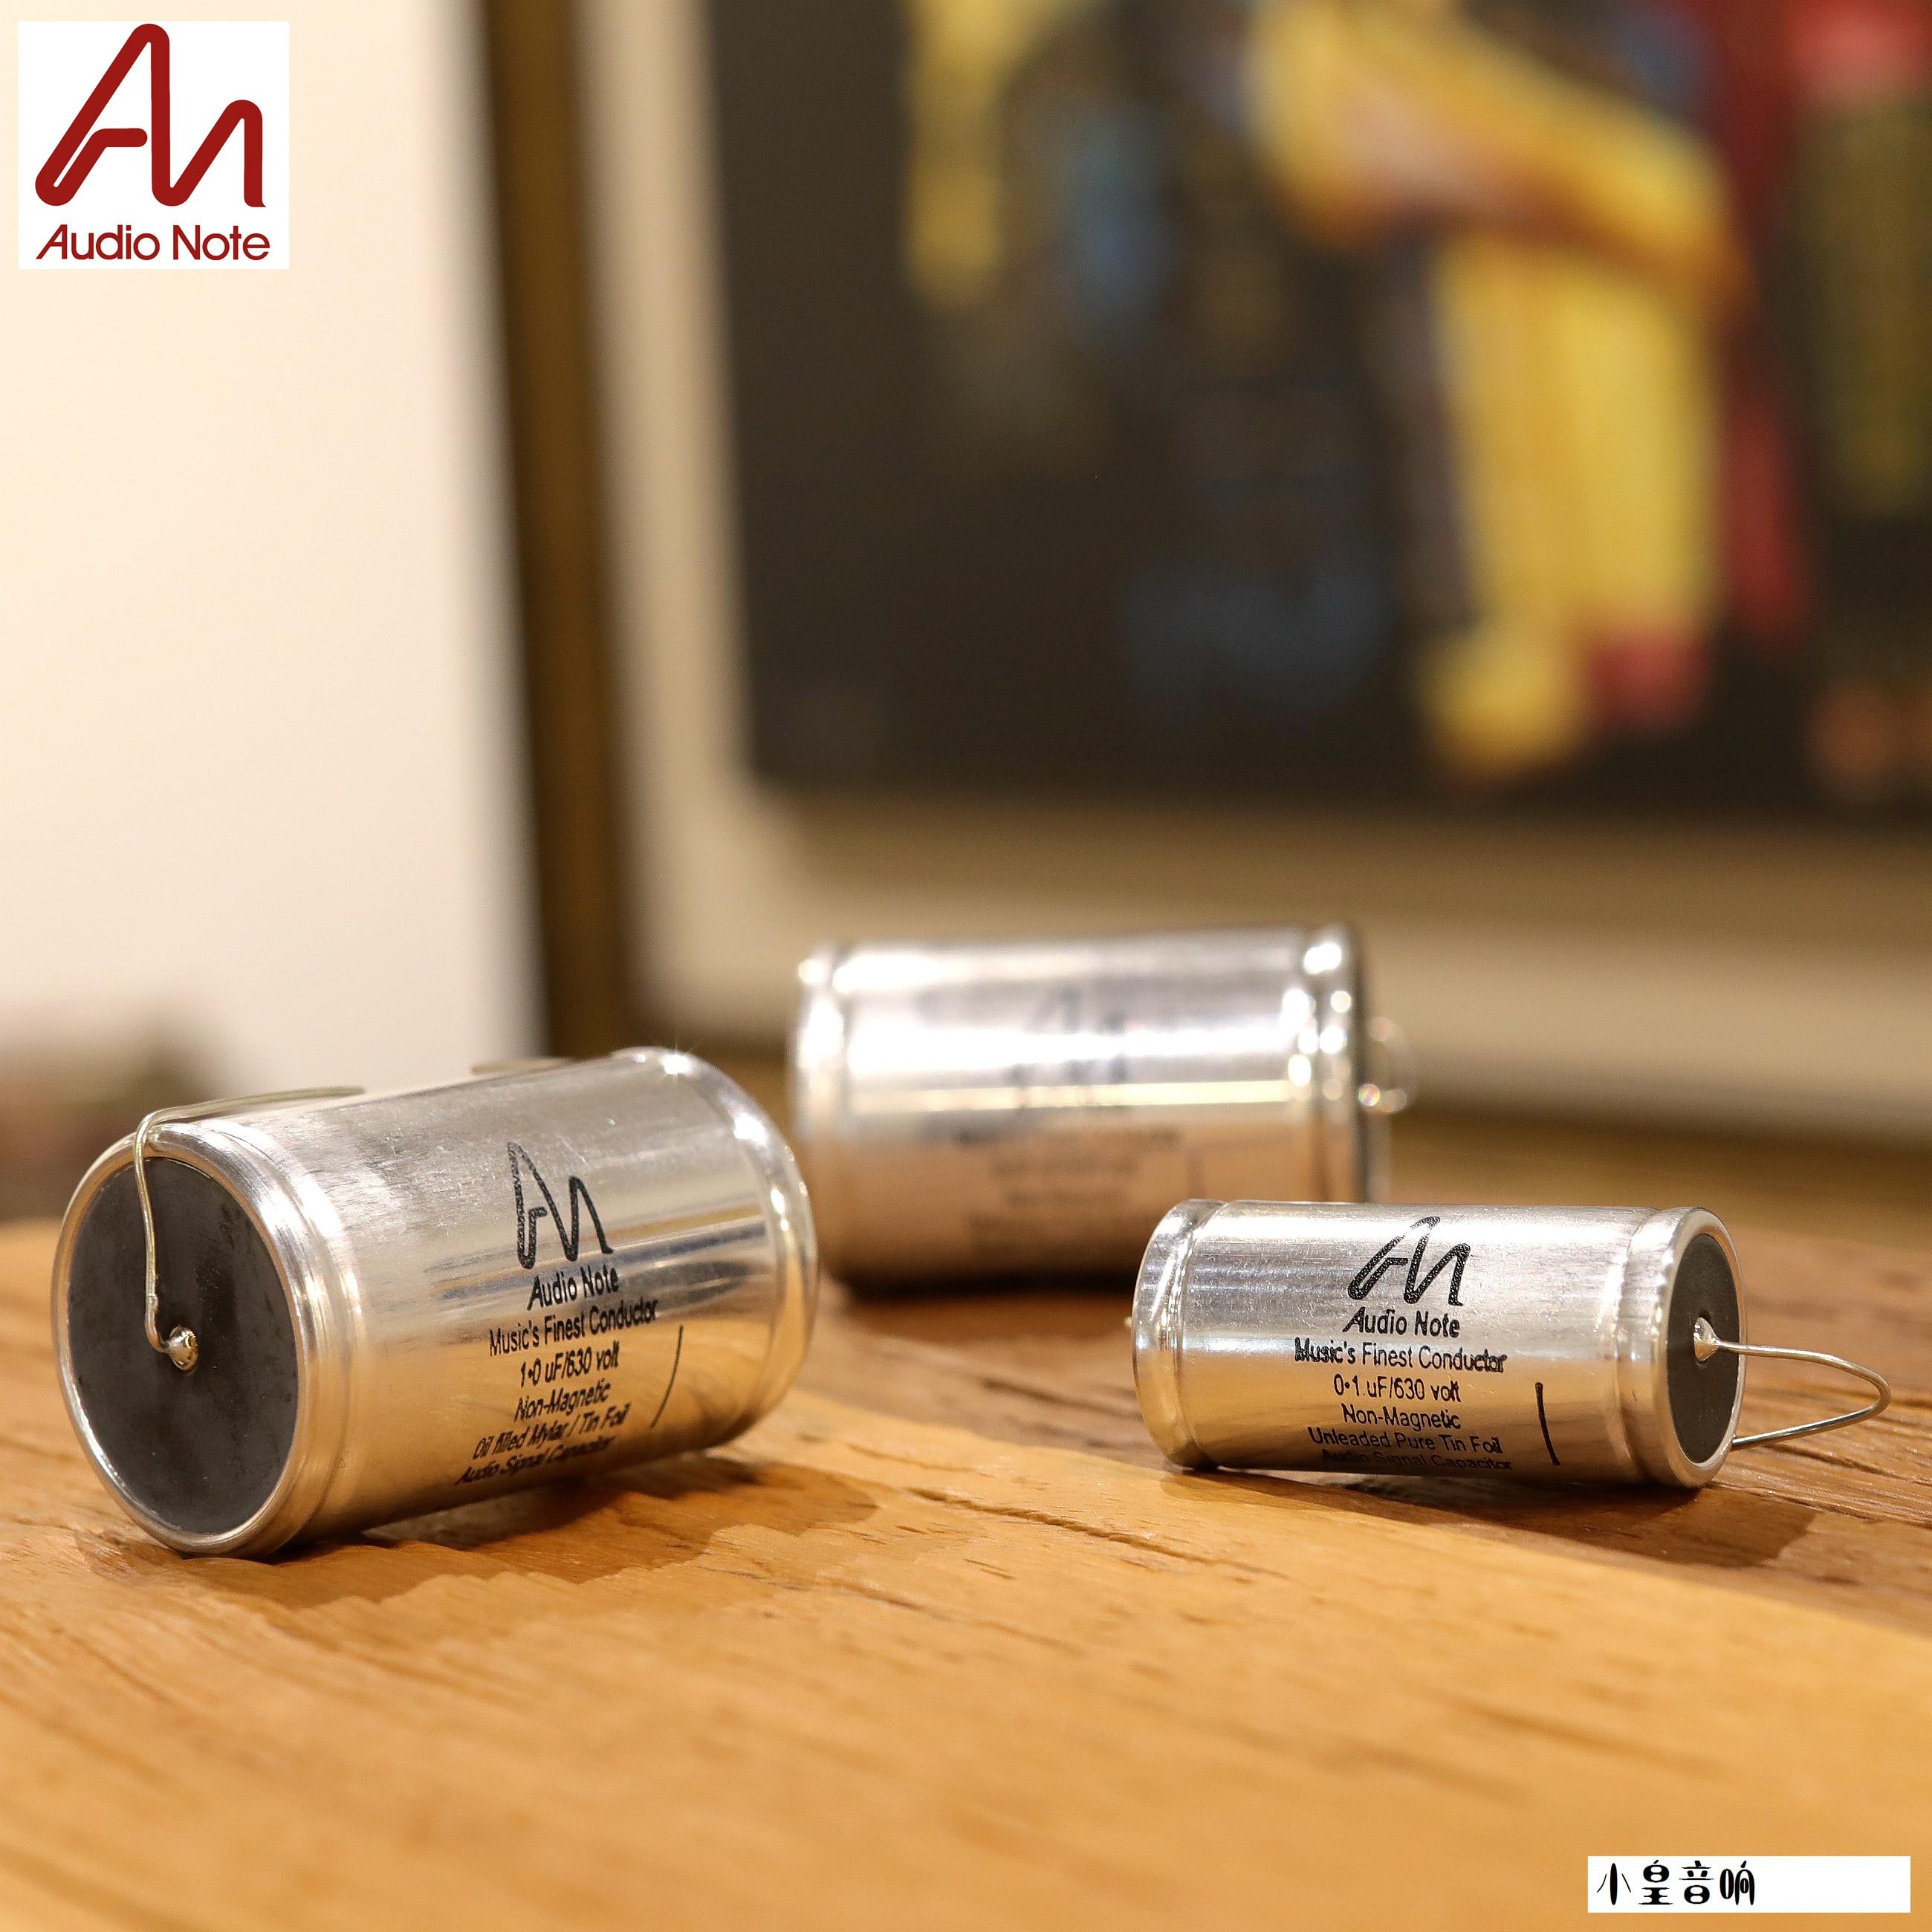 Condensador de señal de Audio de lámina de hojalata no magnética, el...